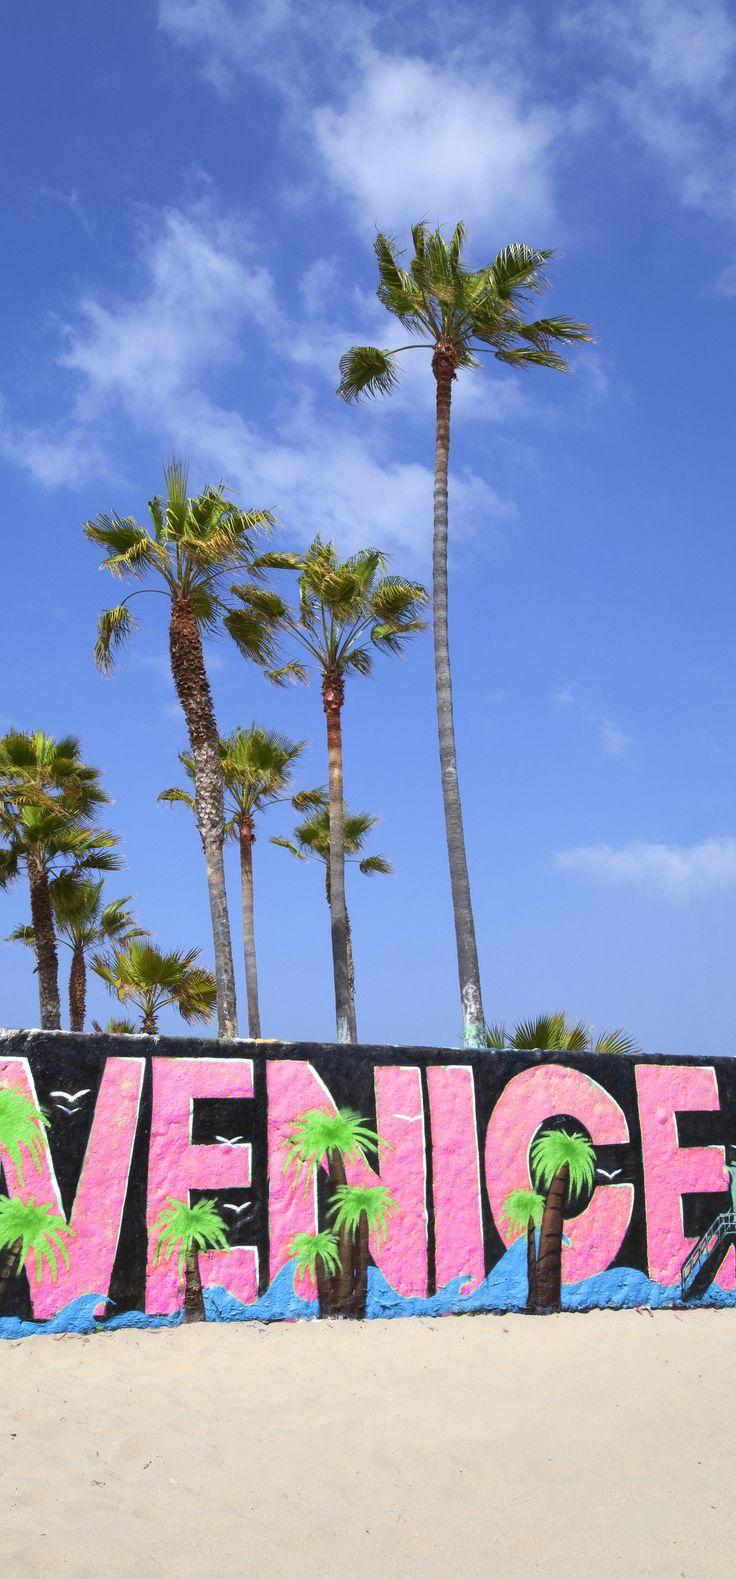 Venice Beach, California, USA